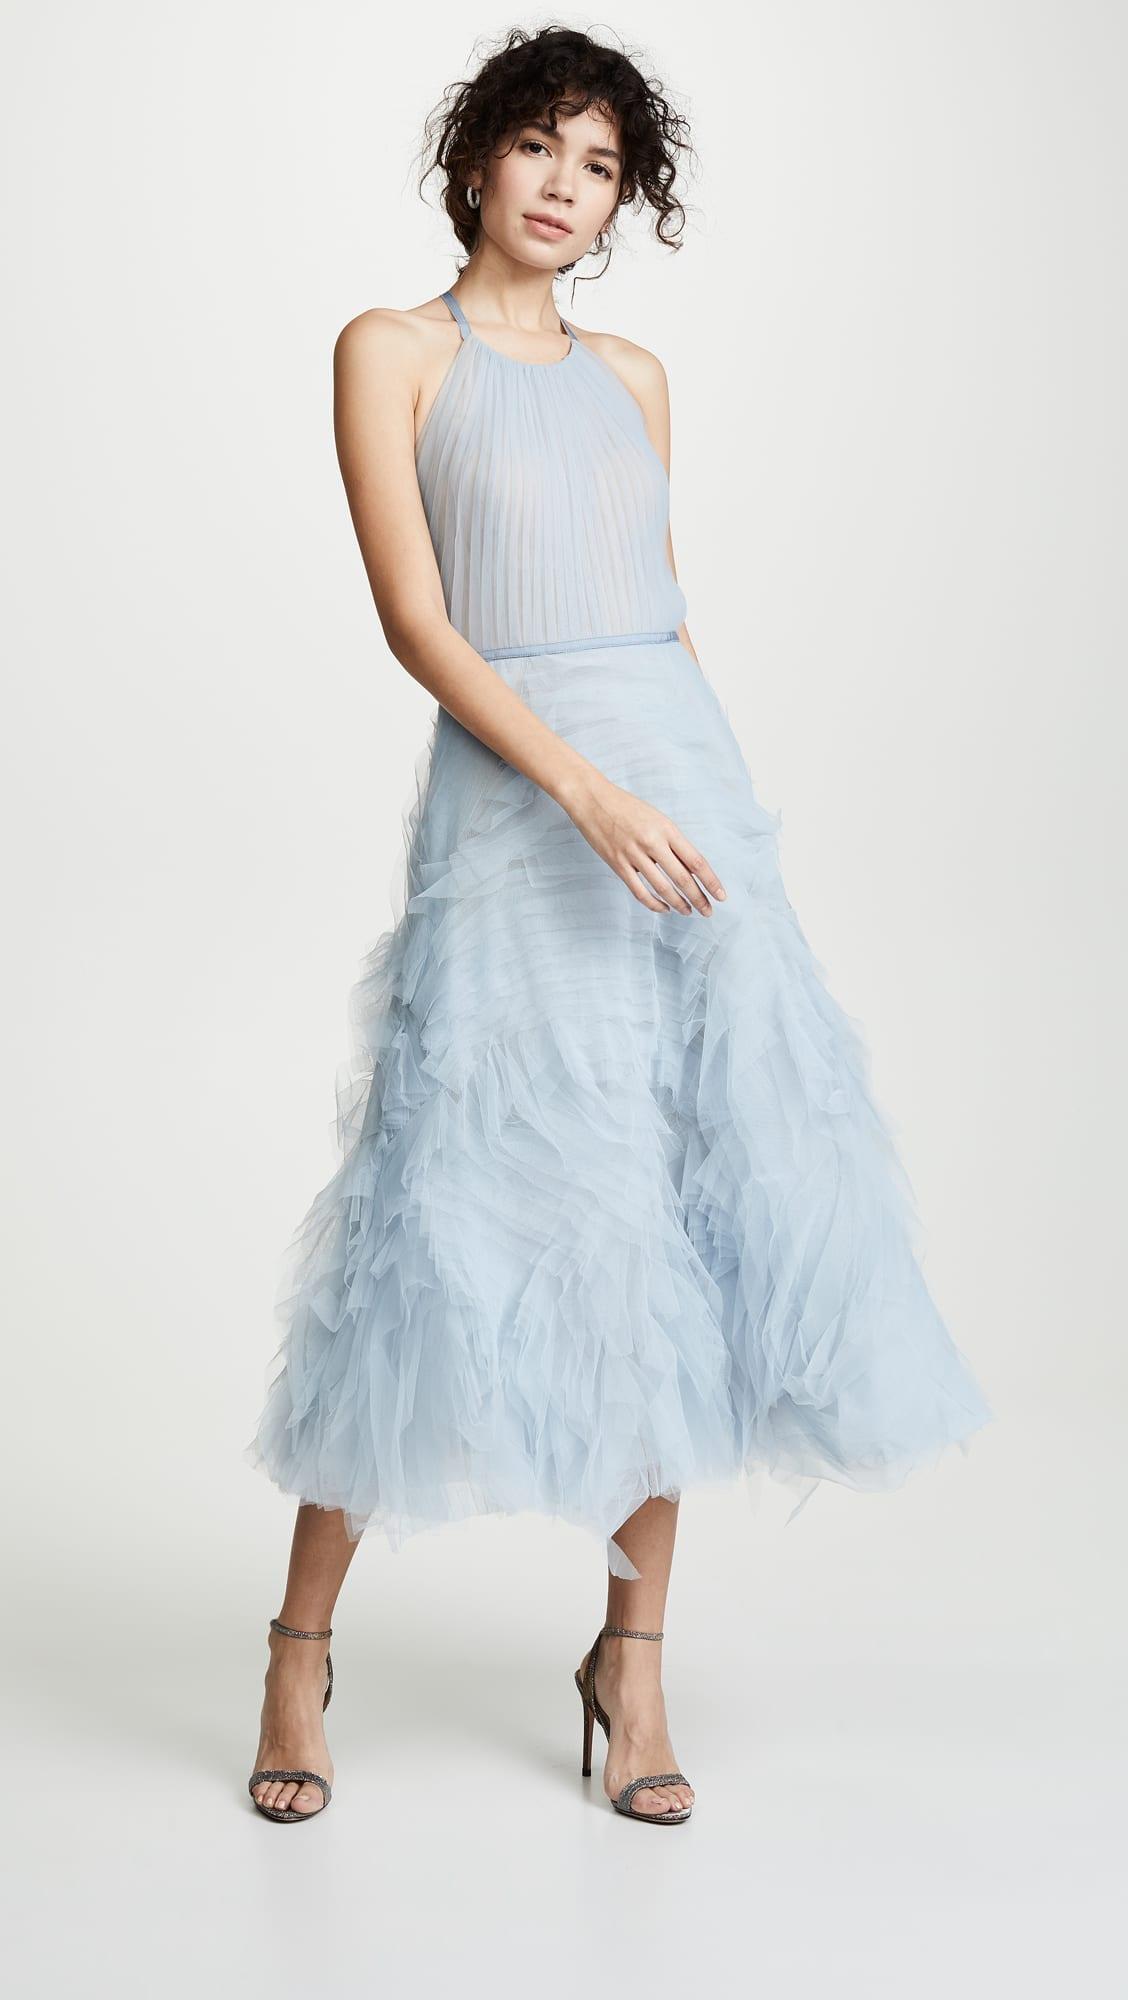 b5e5a4e13c MARCHESA NOTTE Textured Tulle Tea Length Light Blue Gown - We Select ...